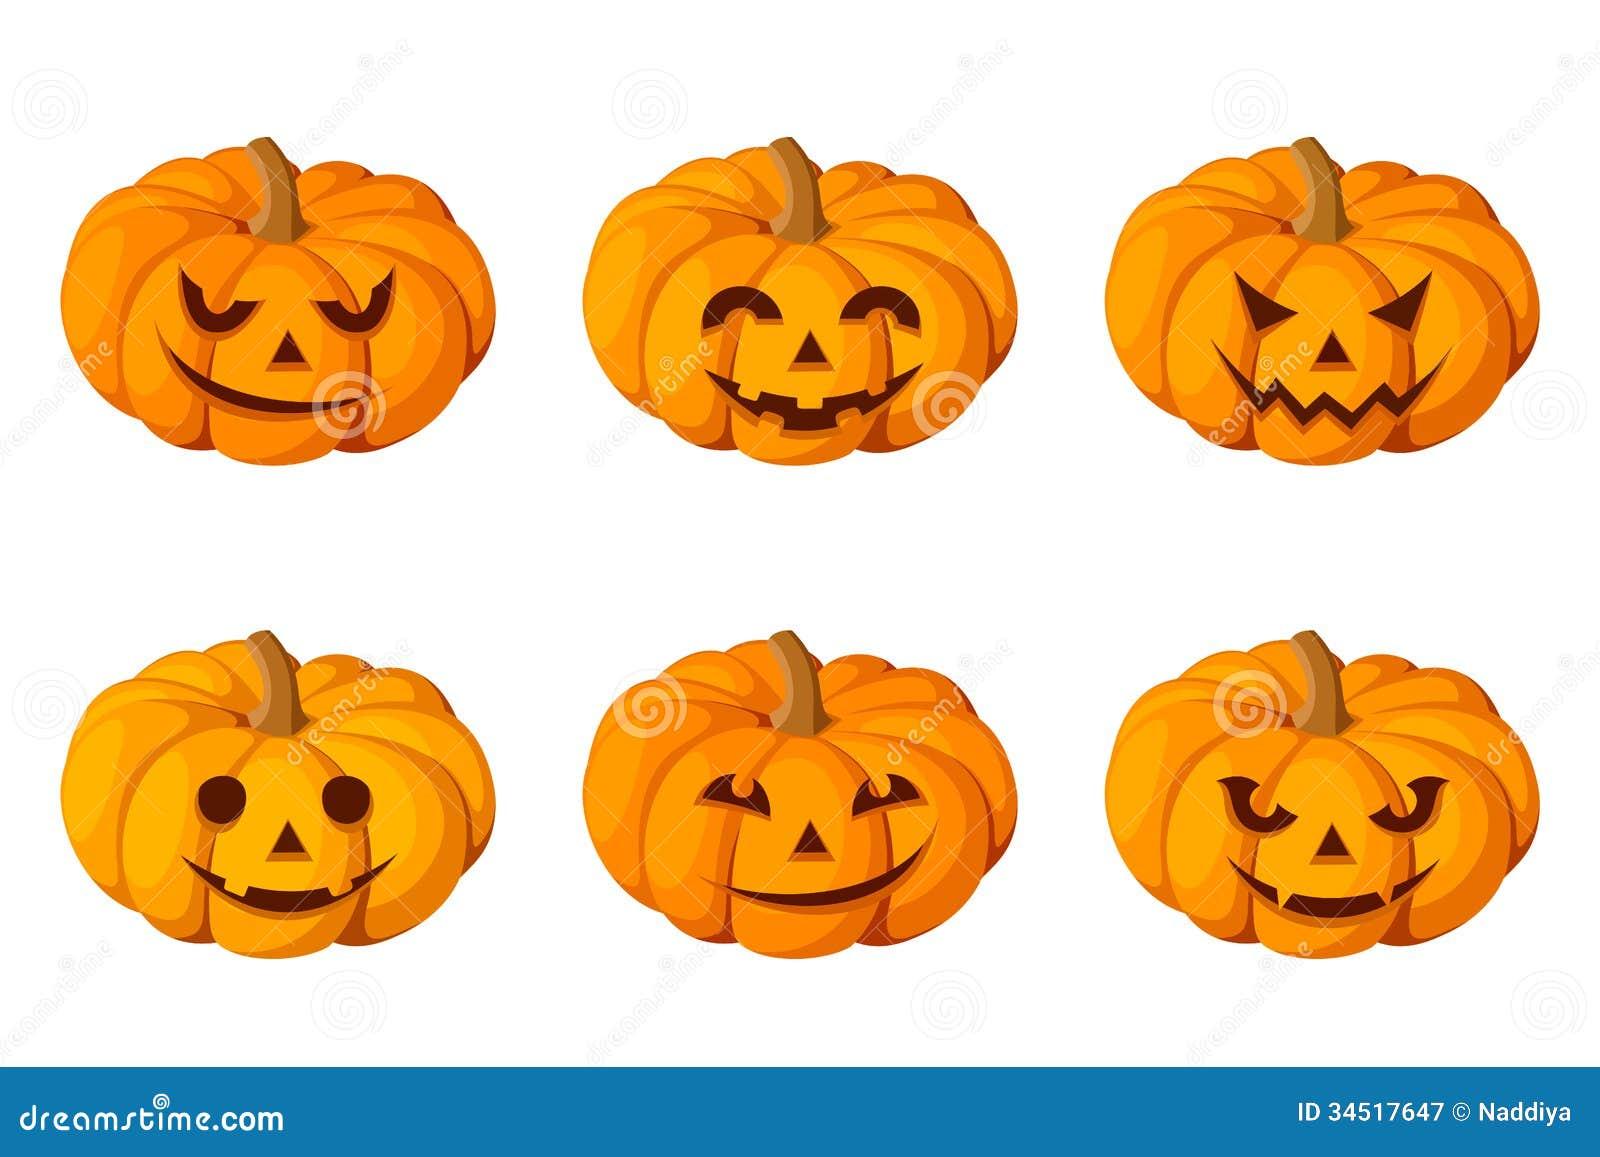 Jack-O-Lantern. Set Of Six Halloween Pumpkins. Royalty ...